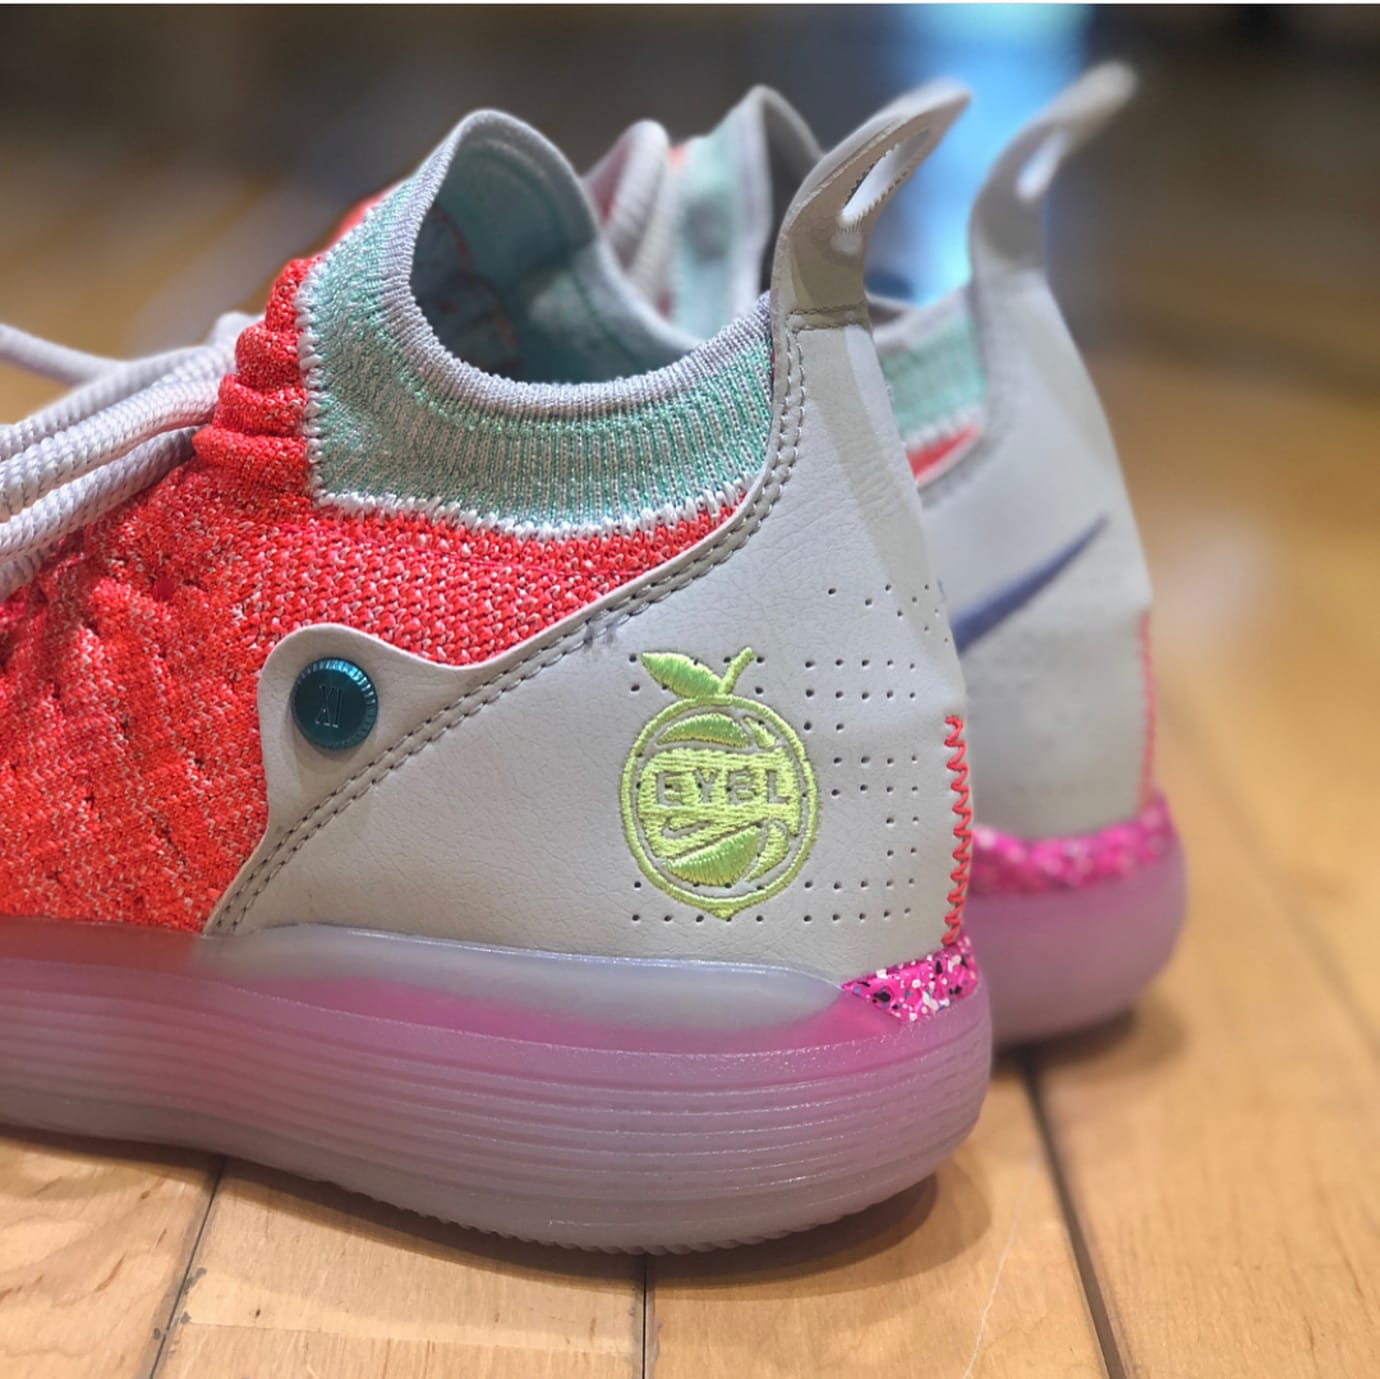 ddc1360db855 Nike KD 11  EYBL  Peach Jam Release Date AO2604-600